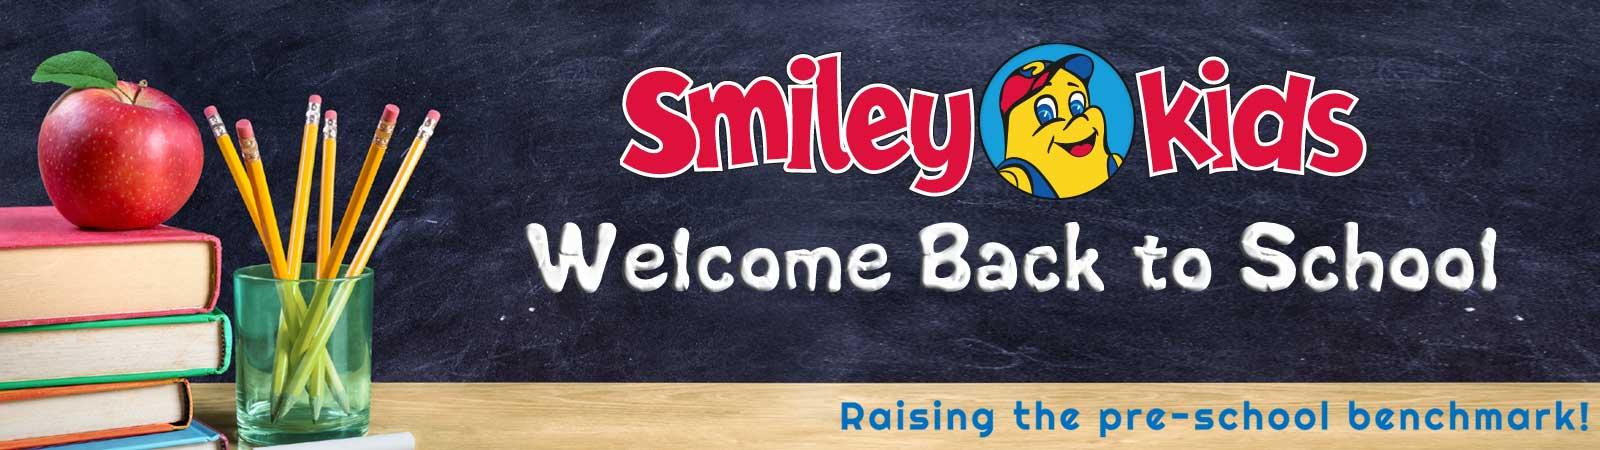 Smiley Kids Back to School